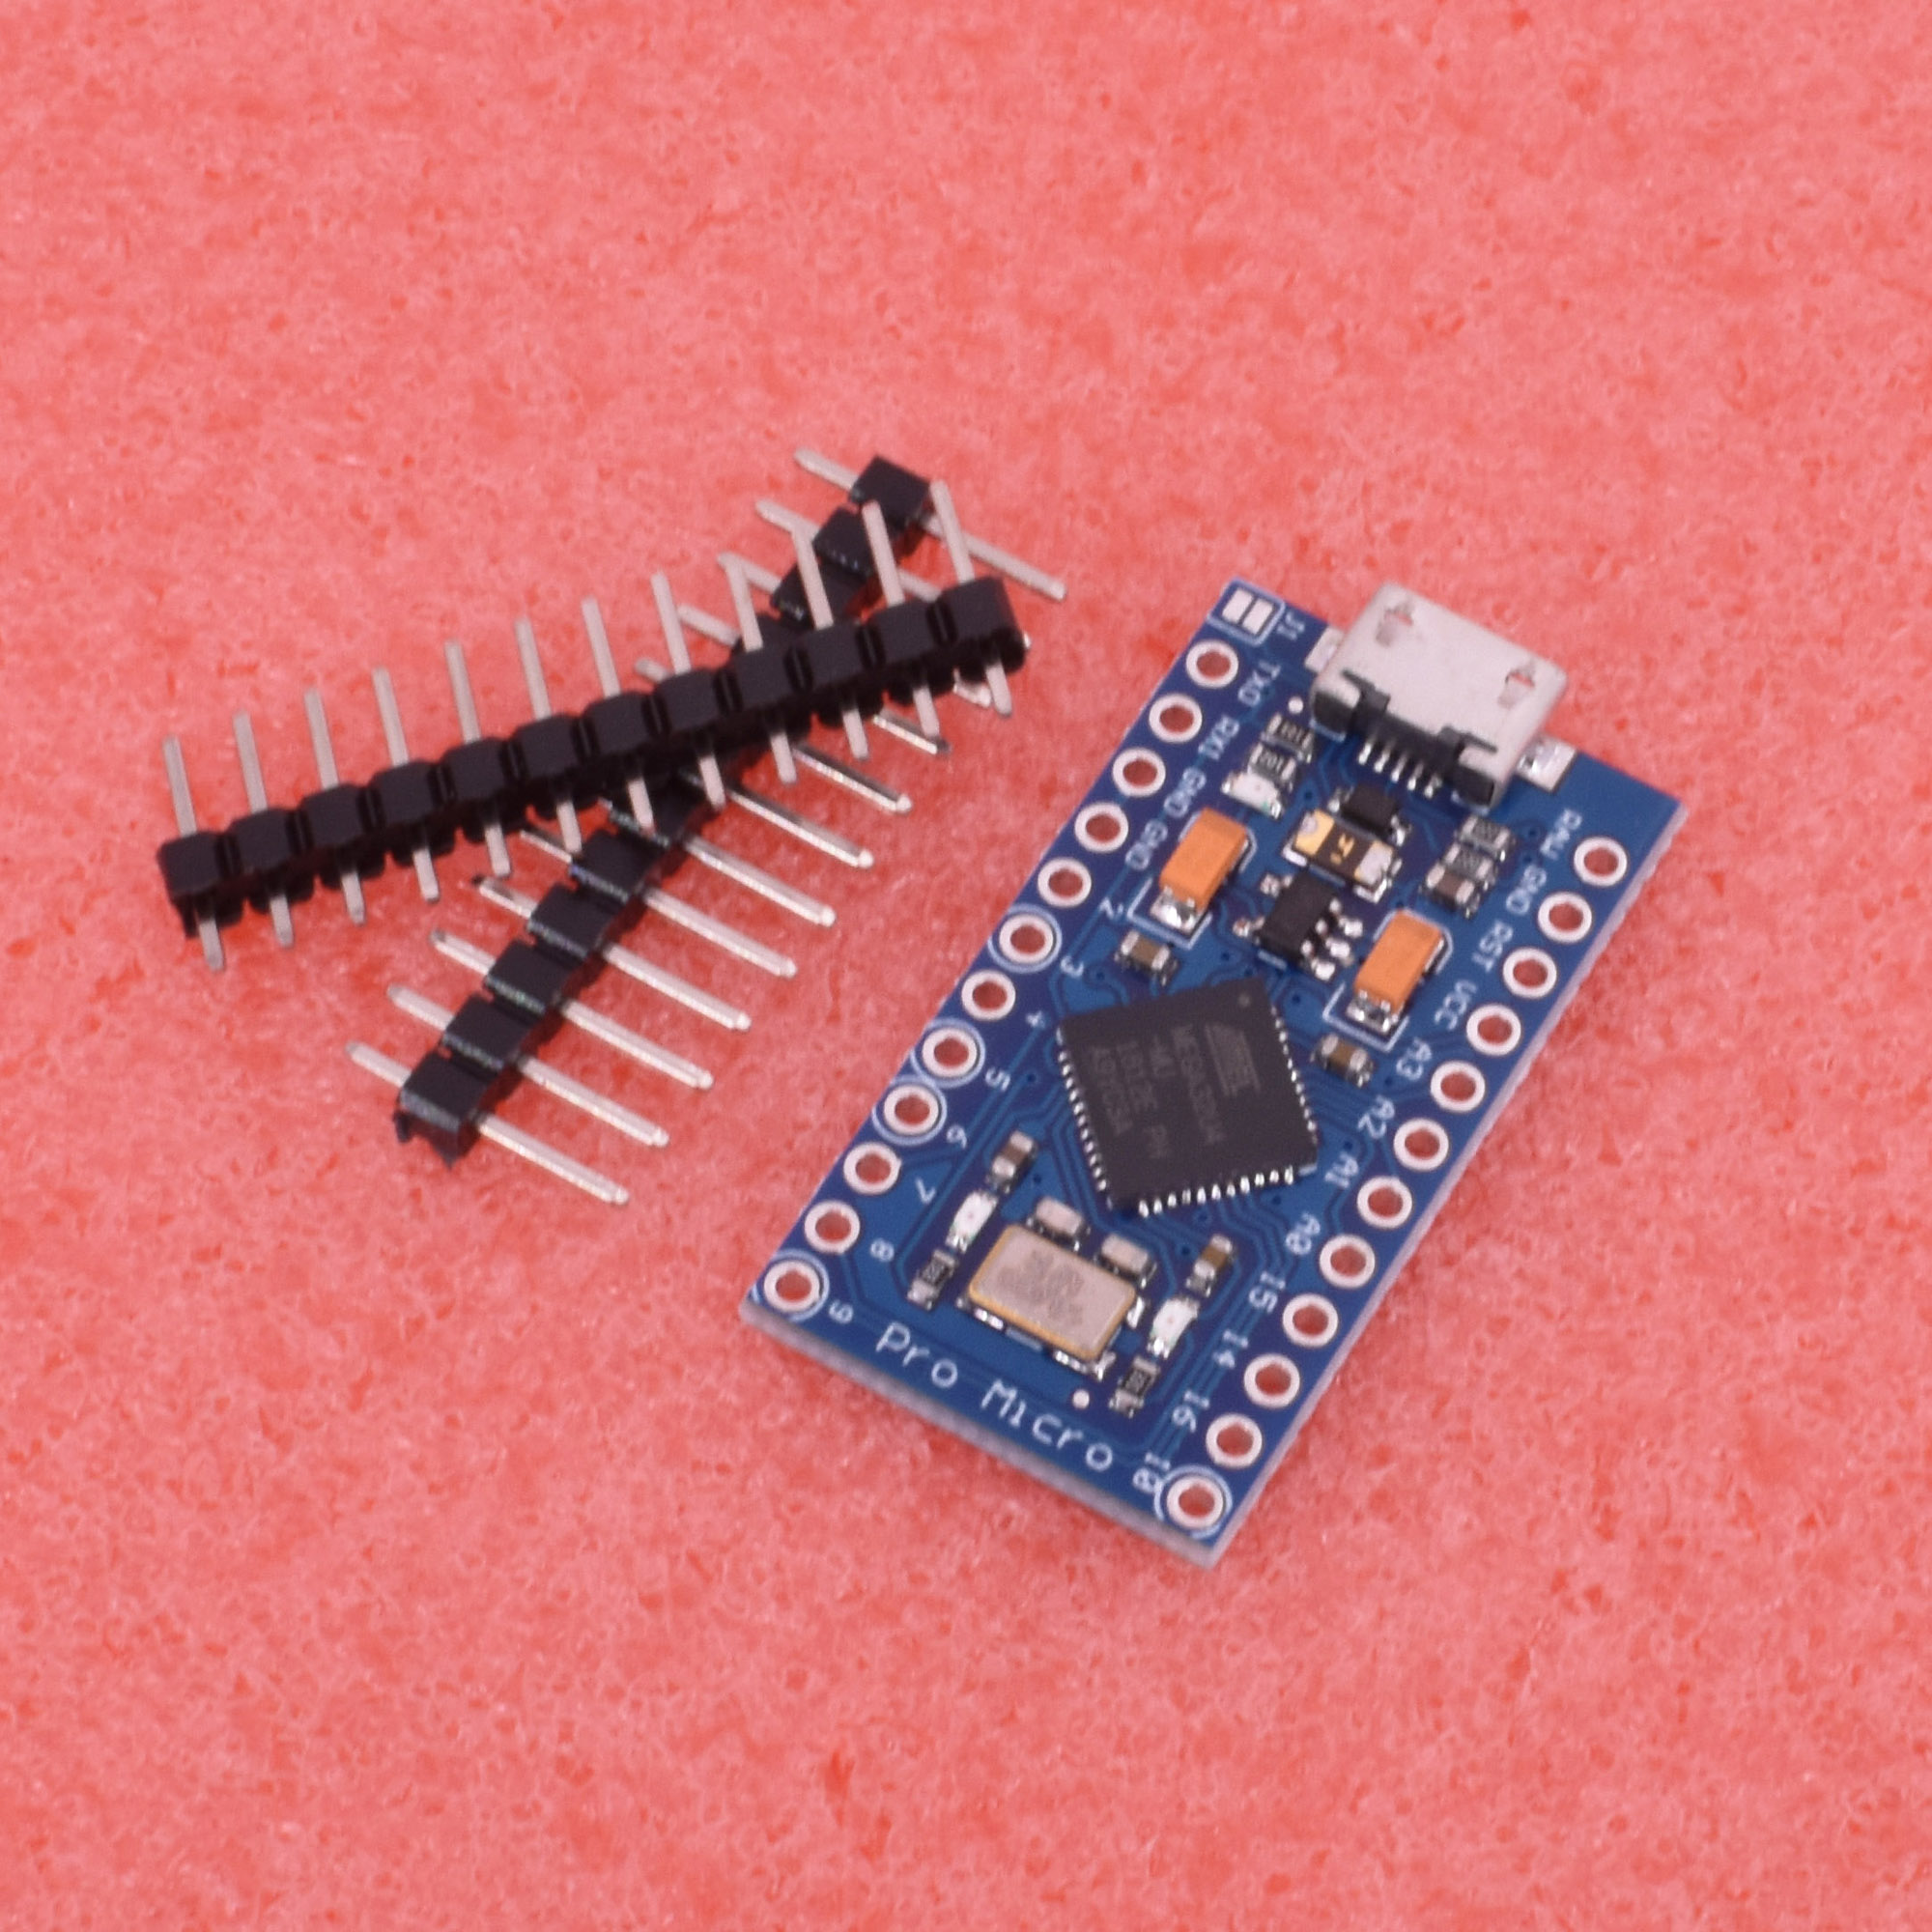 Nuevo Pro Micro Atmega 32u4 5v 16mhz Reemplazar Atmega 328 Arduino Pro Mini Ebay